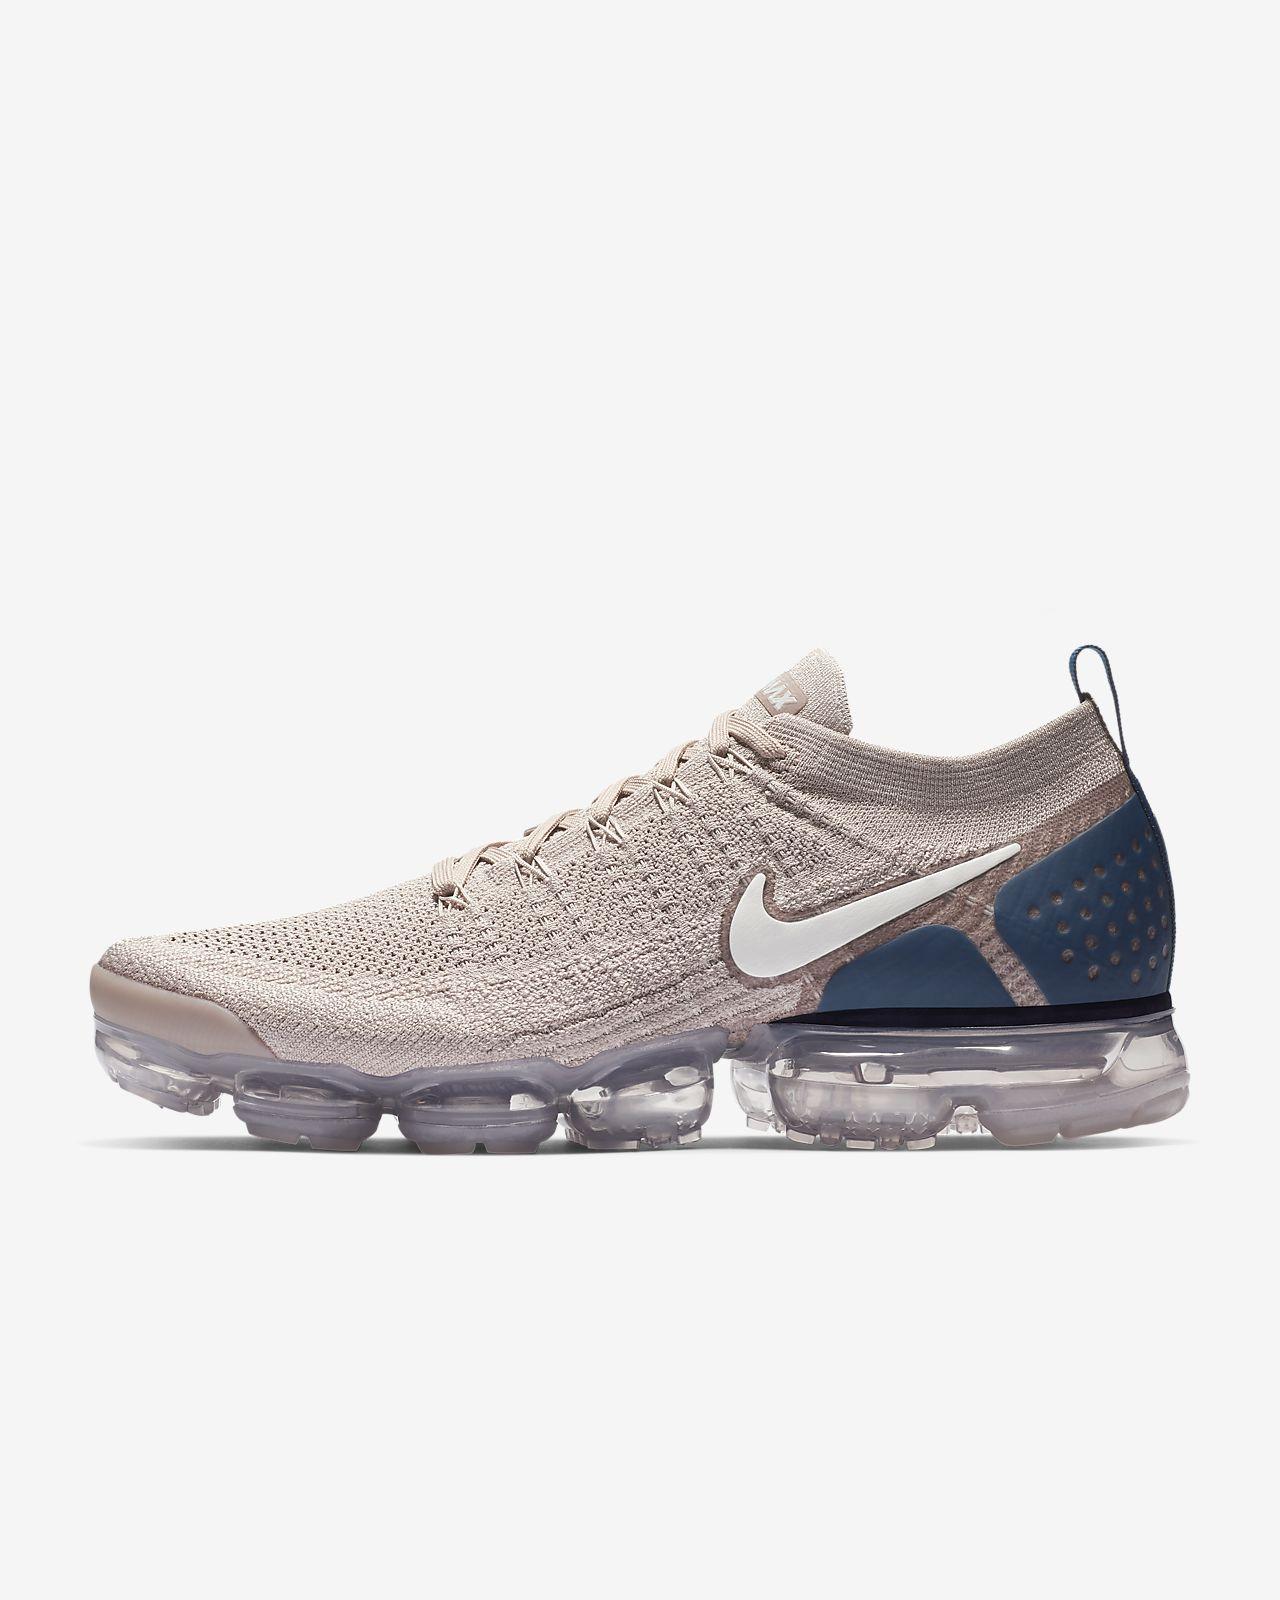 8854a4549bb Nike Air VaporMax Flyknit 2 Shoe. Nike.com CH